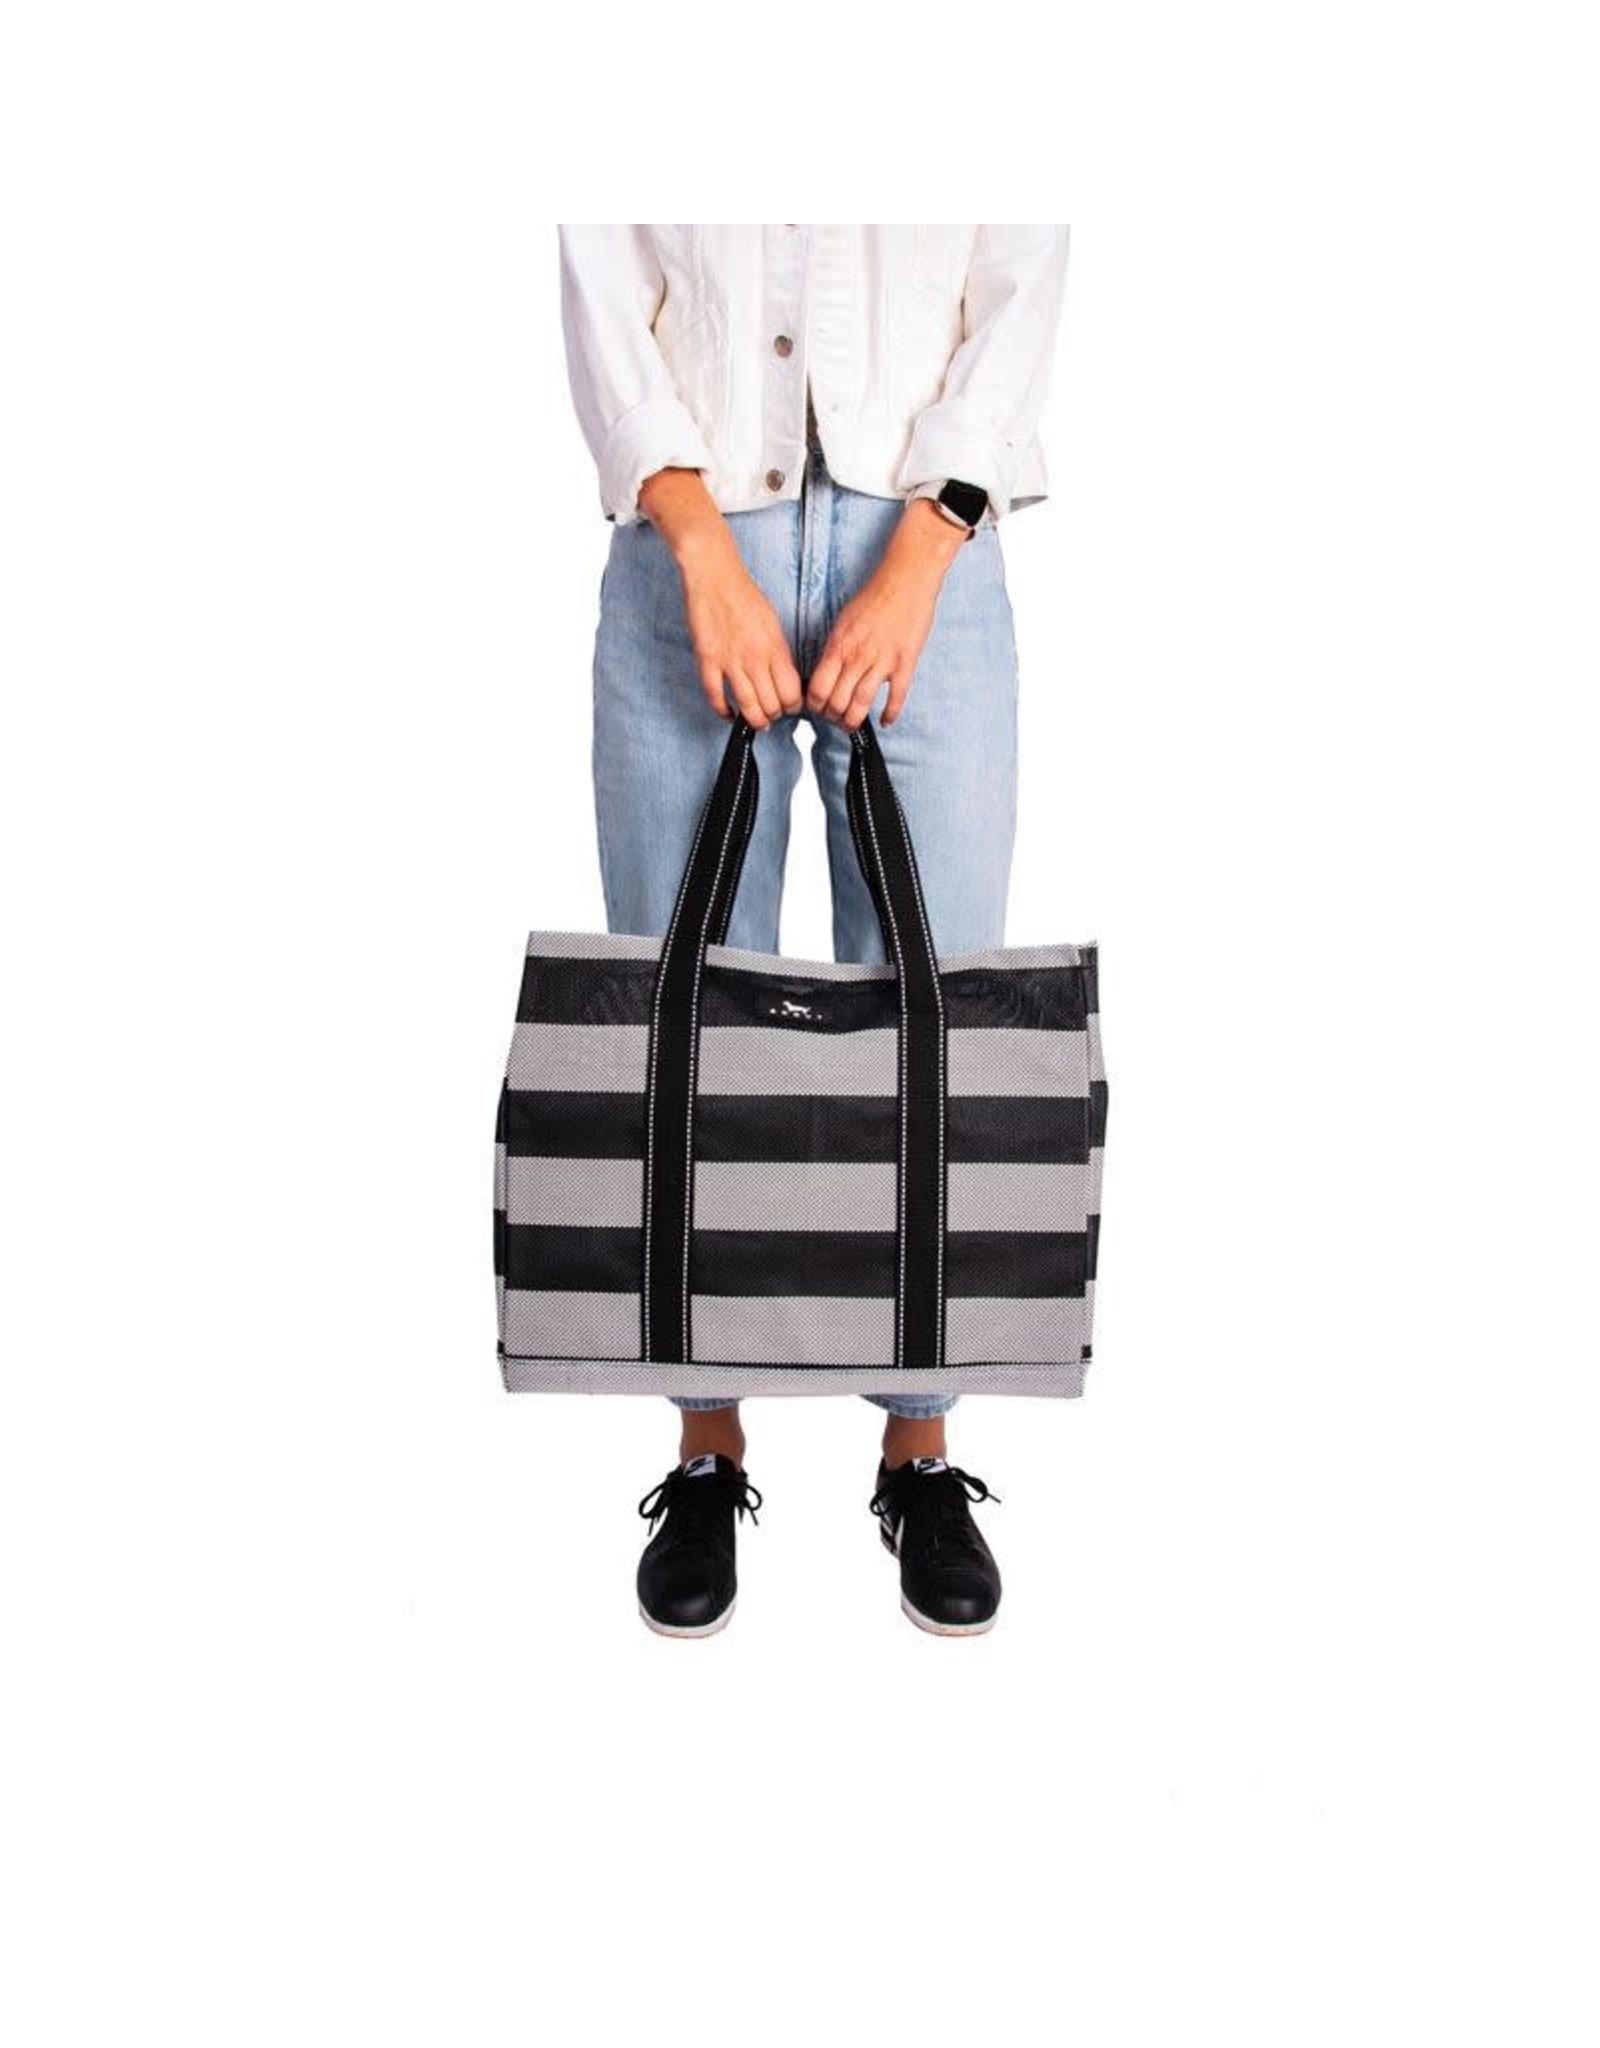 Scout Bags Baja Black Roadtripper Breathable Open Top Tote Bag